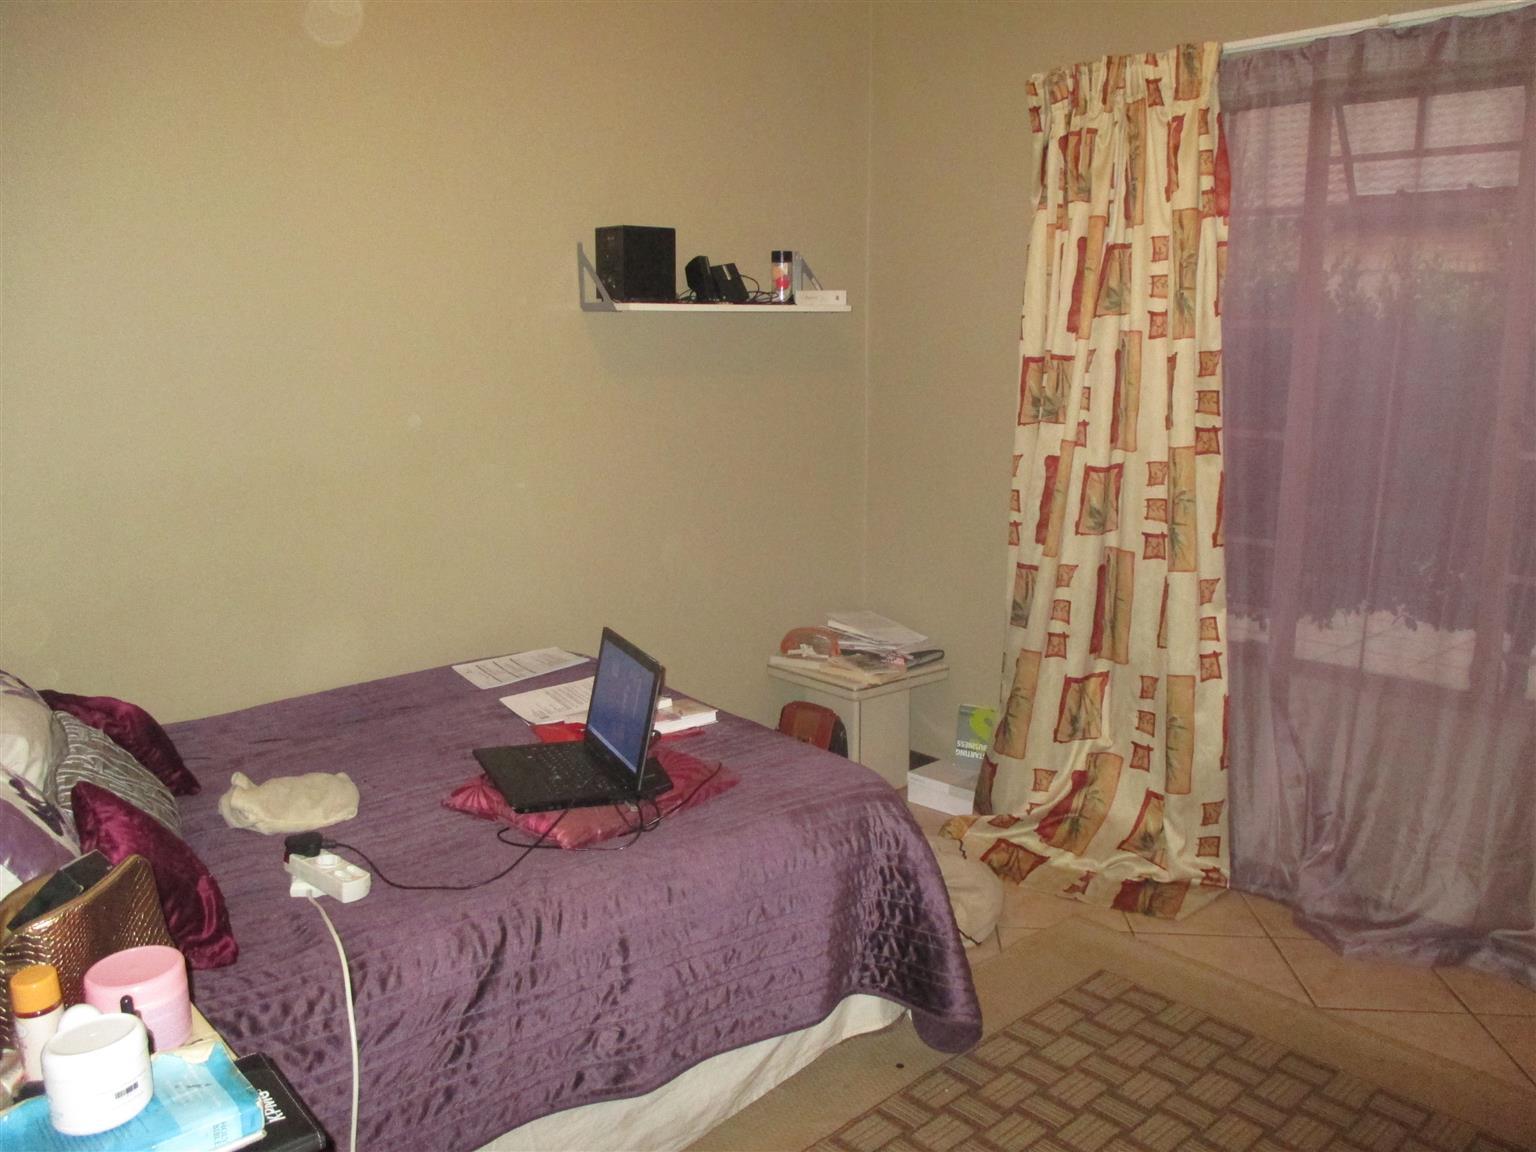 EQUESTRIA: SPACIOUS 3 BEDROOM, 2 BATHROOM, LOOSE STANDING SIMPLEX FOR SALE